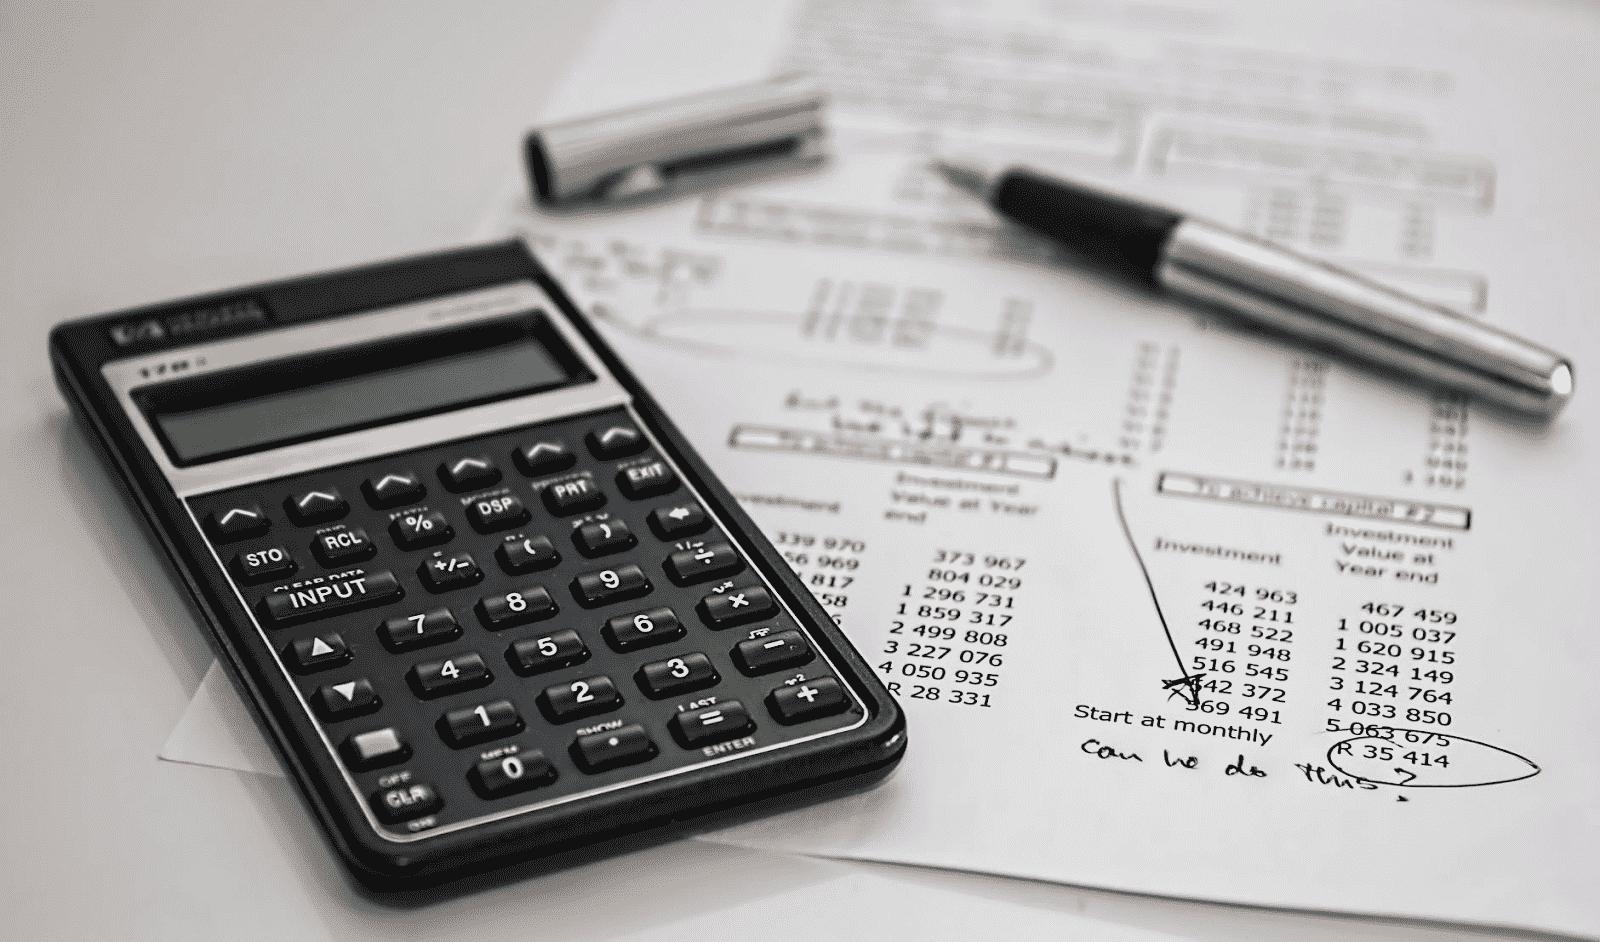 Calculator Pen and Data Sheet